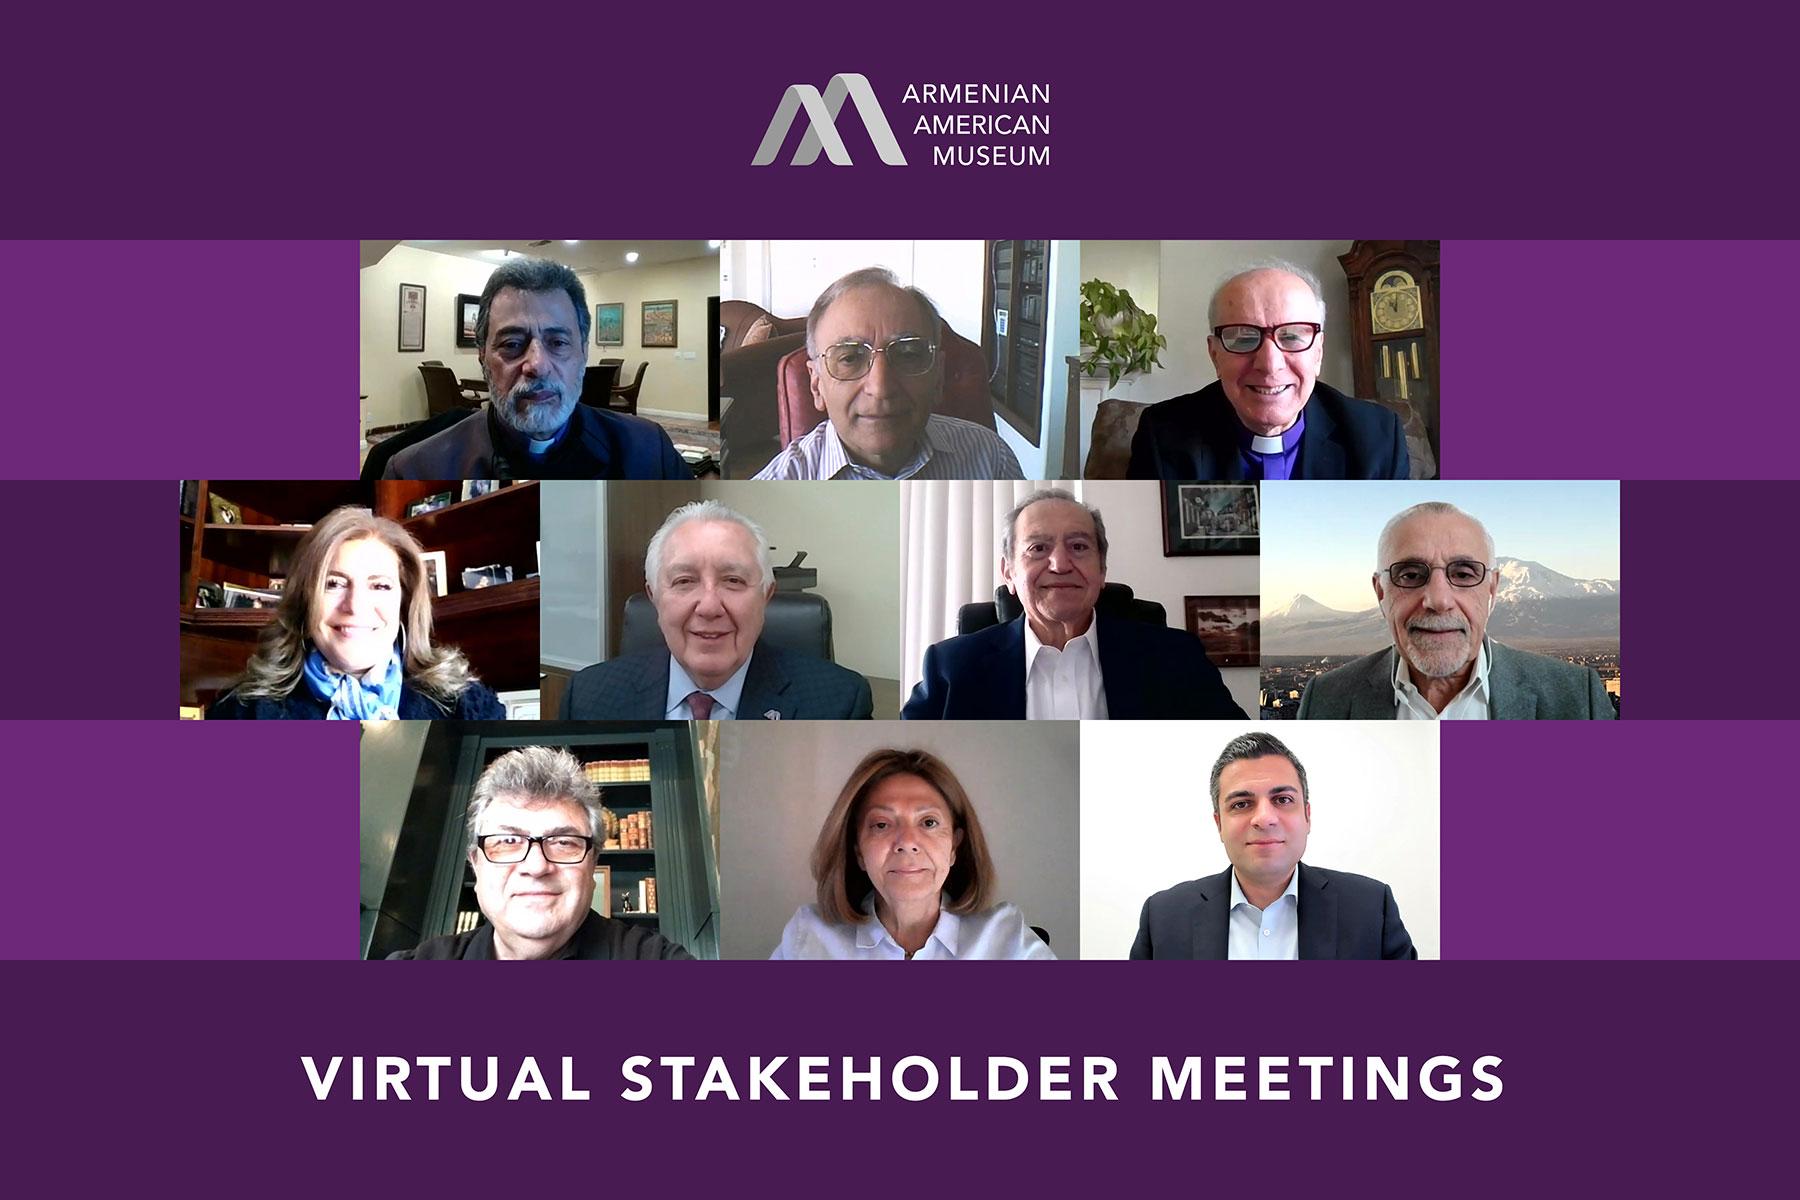 Armenian American Museum Virtual Stakeholder Meetings